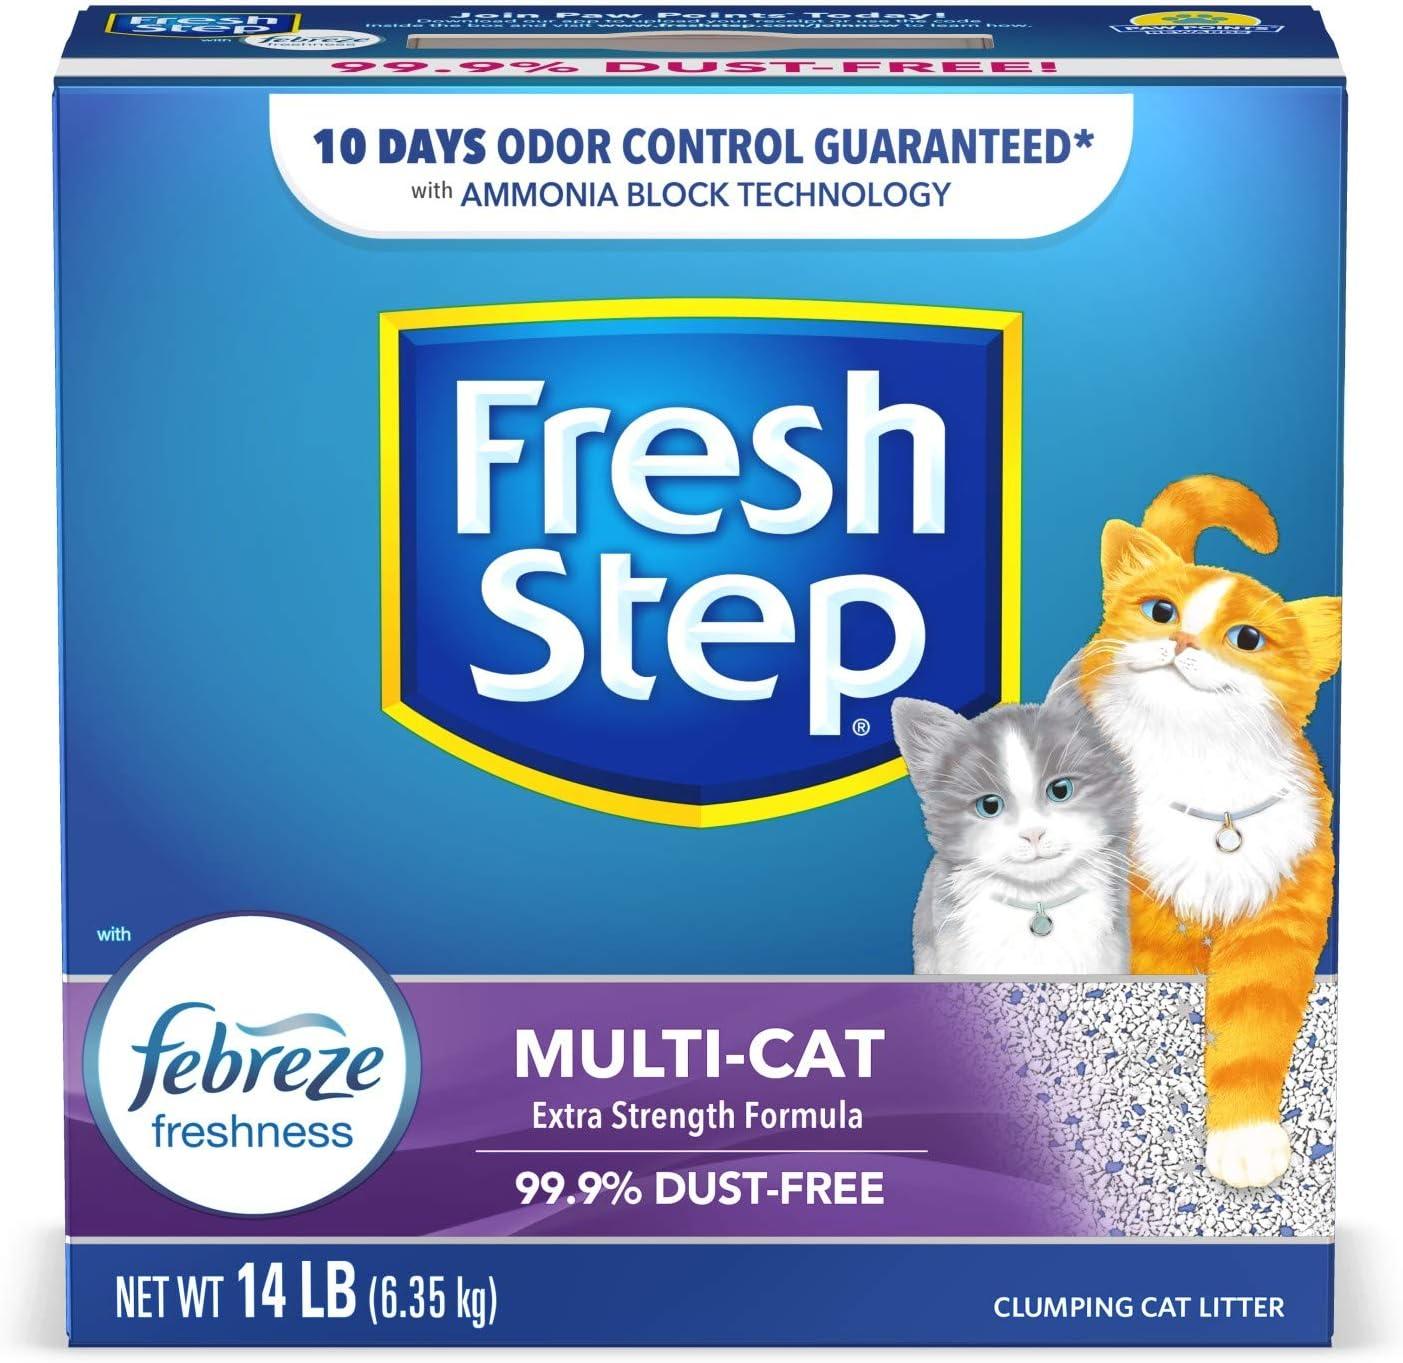 Fresh Step Multi-Cat with Febreze Freshness Clumping Cat Litter